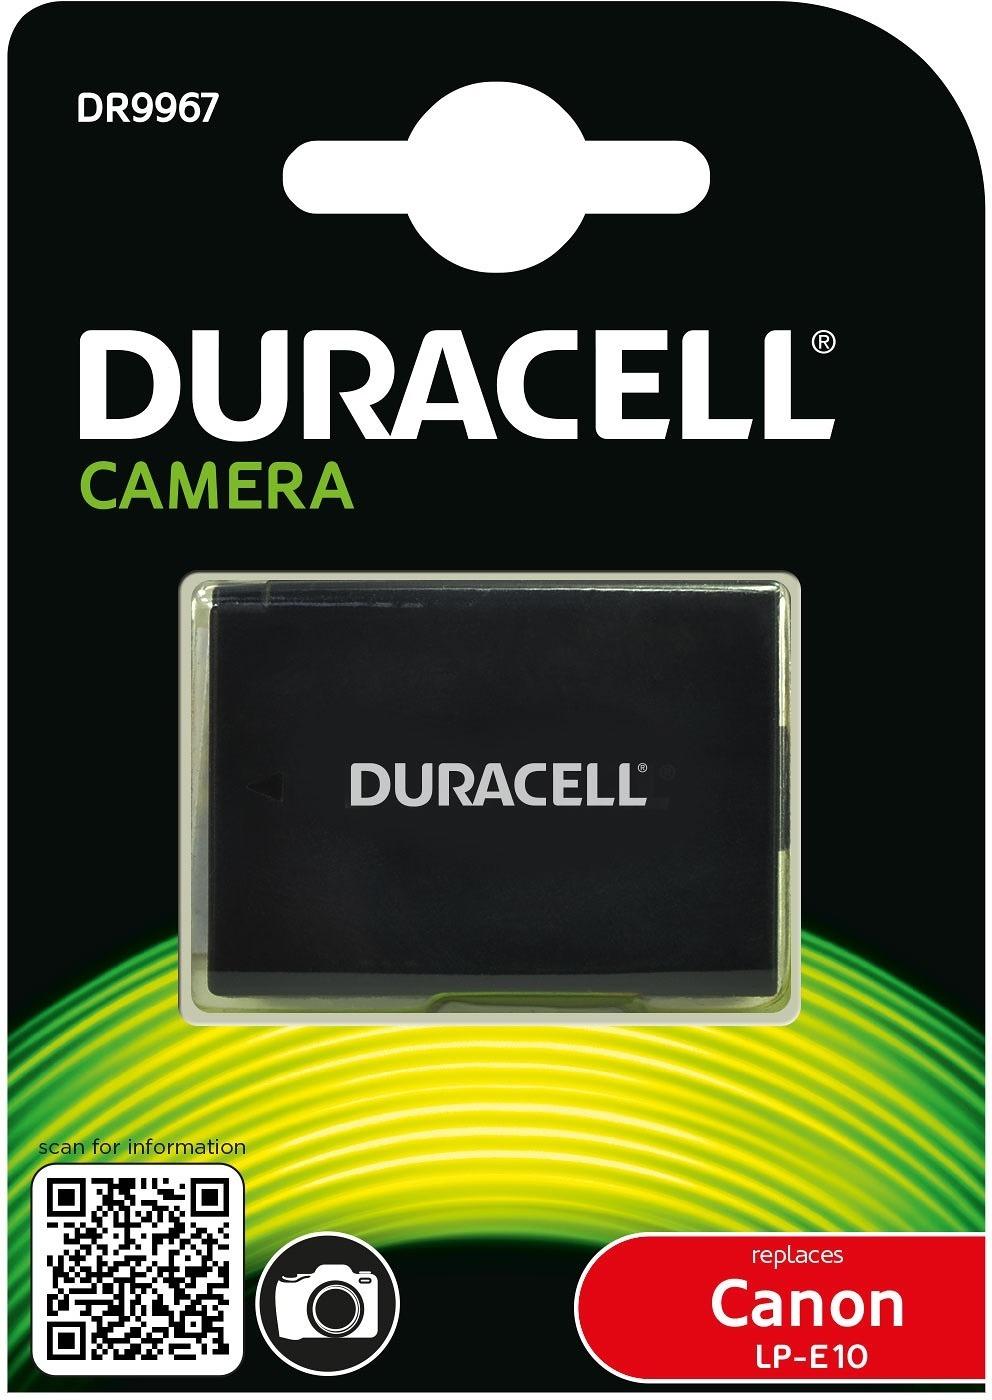 Duracell DR9967 - akumulator / zamiennik LP-E10 do Canon / 950mAh Duracell DR9967